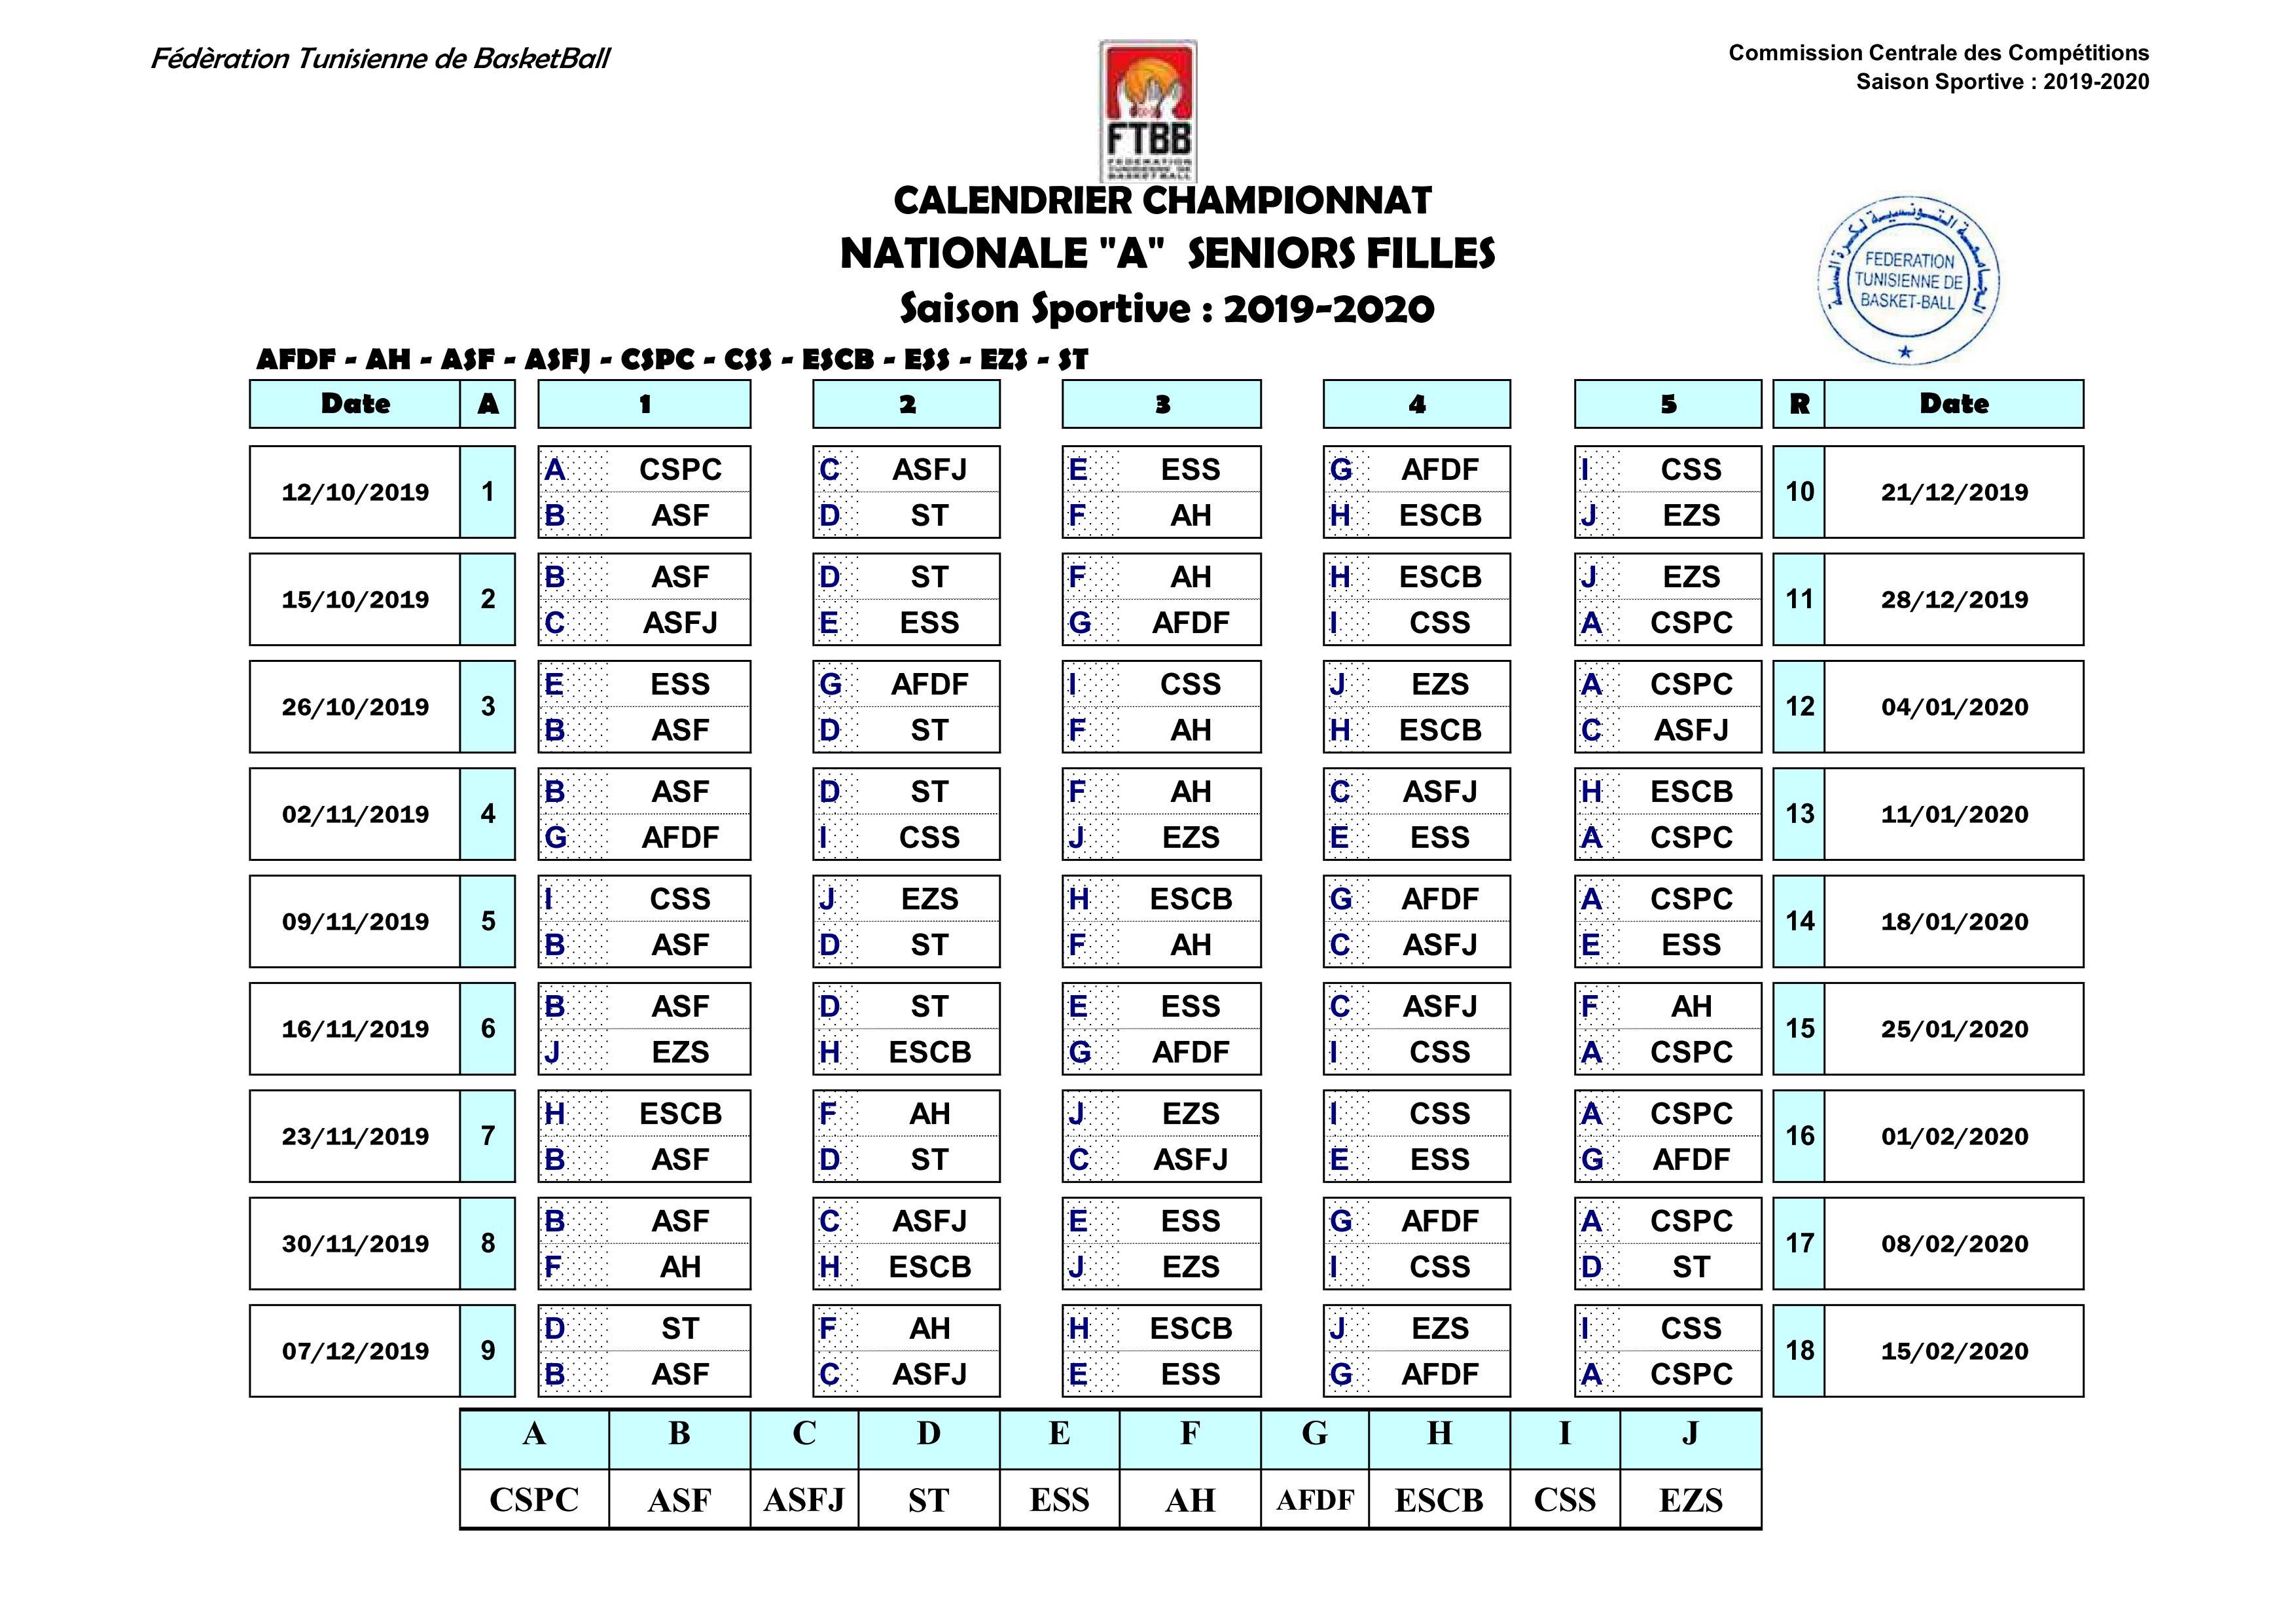 Calendrier National 2020 2019.Calendrier Na Sf 2019 2020 Ftbb